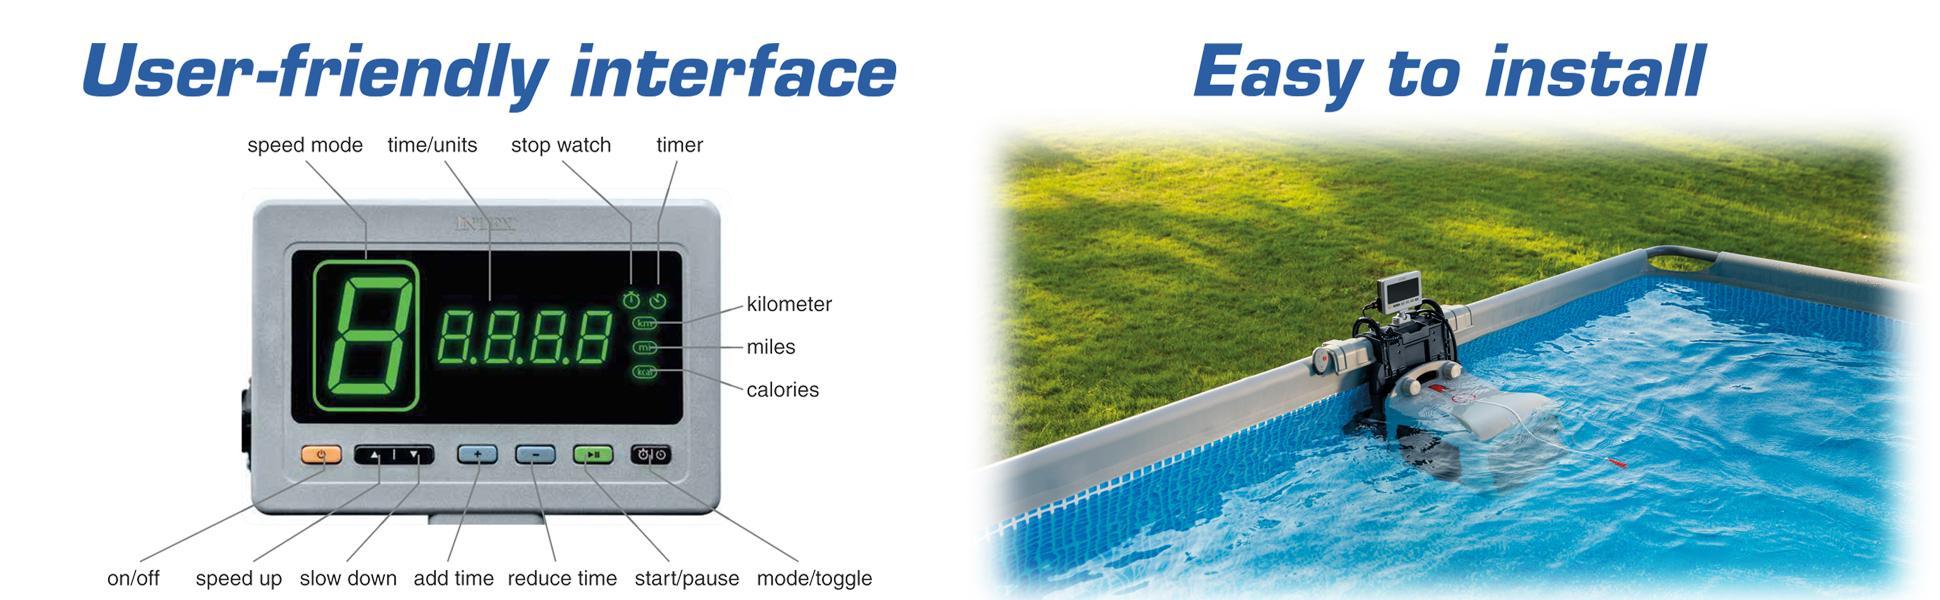 Intex Hydro Flow Swim Trainer